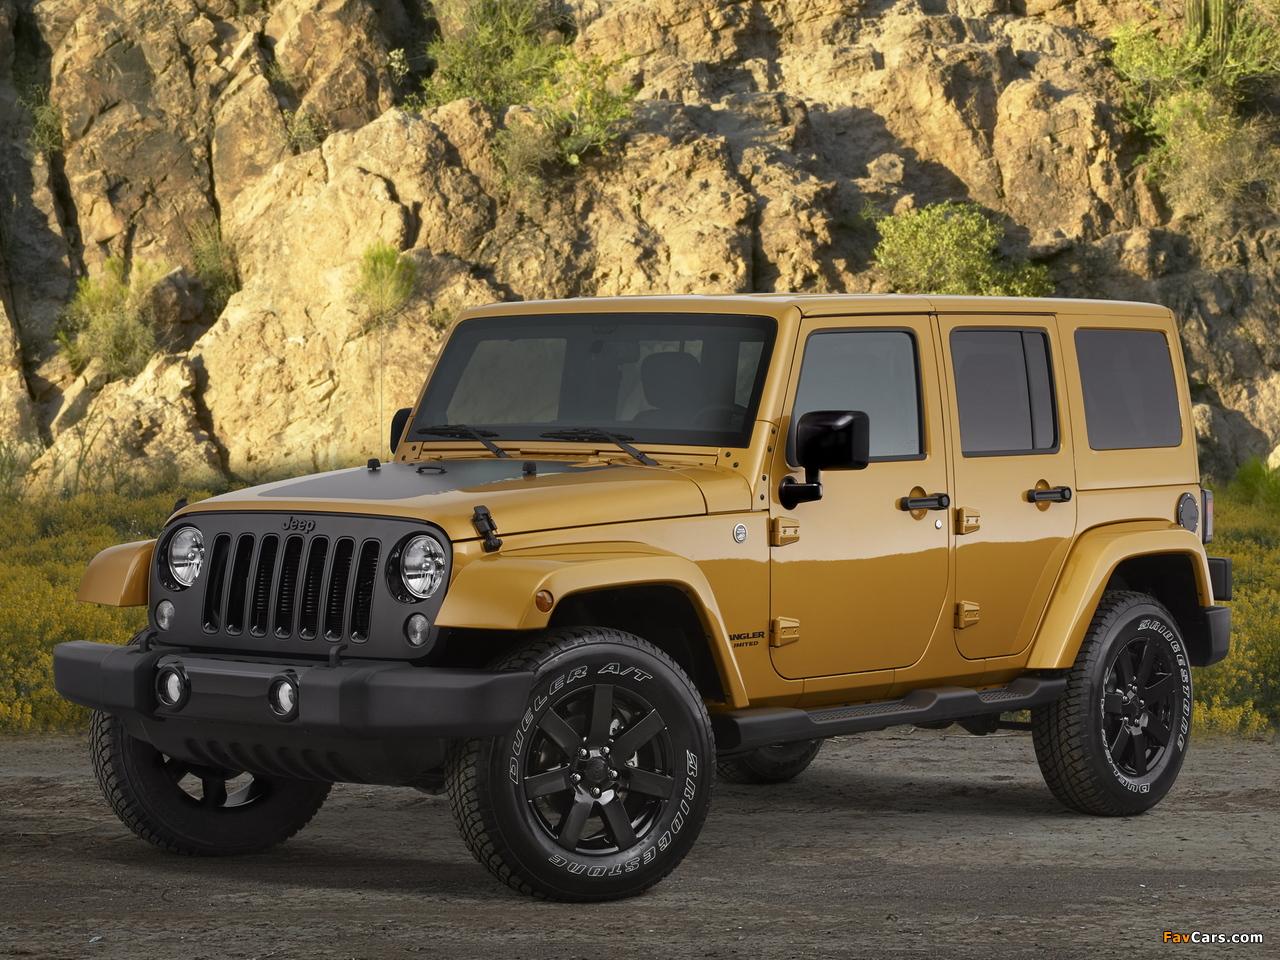 Jeep Wrangler Unlimited Altitude (JK) 2014 photos (1280 x 960)